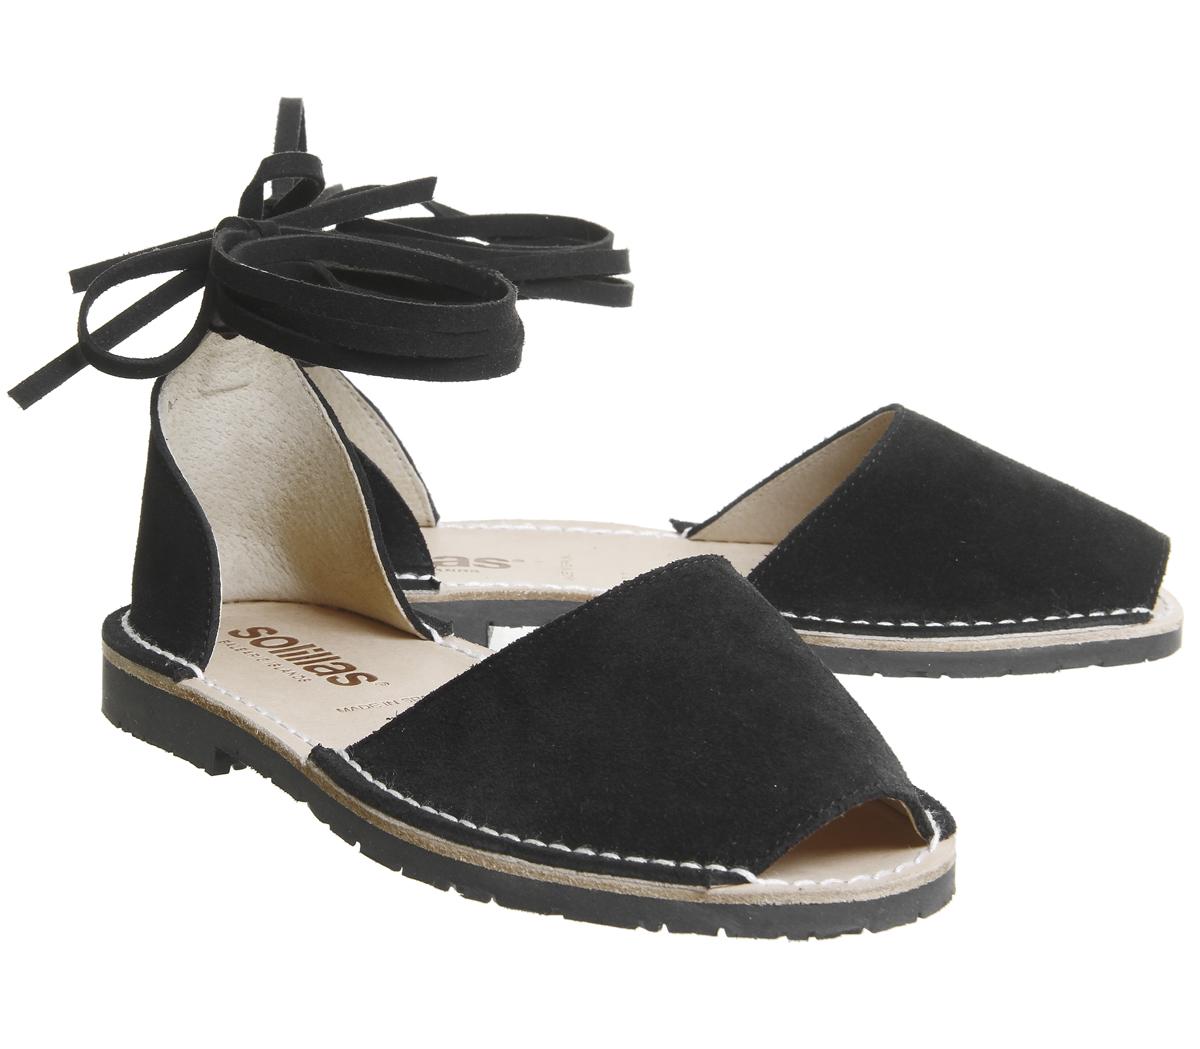 Damen Wildleder-Sandalen Solillas Ankle Sandalen Schwarz Wildleder-Sandalen Damen 7d82de